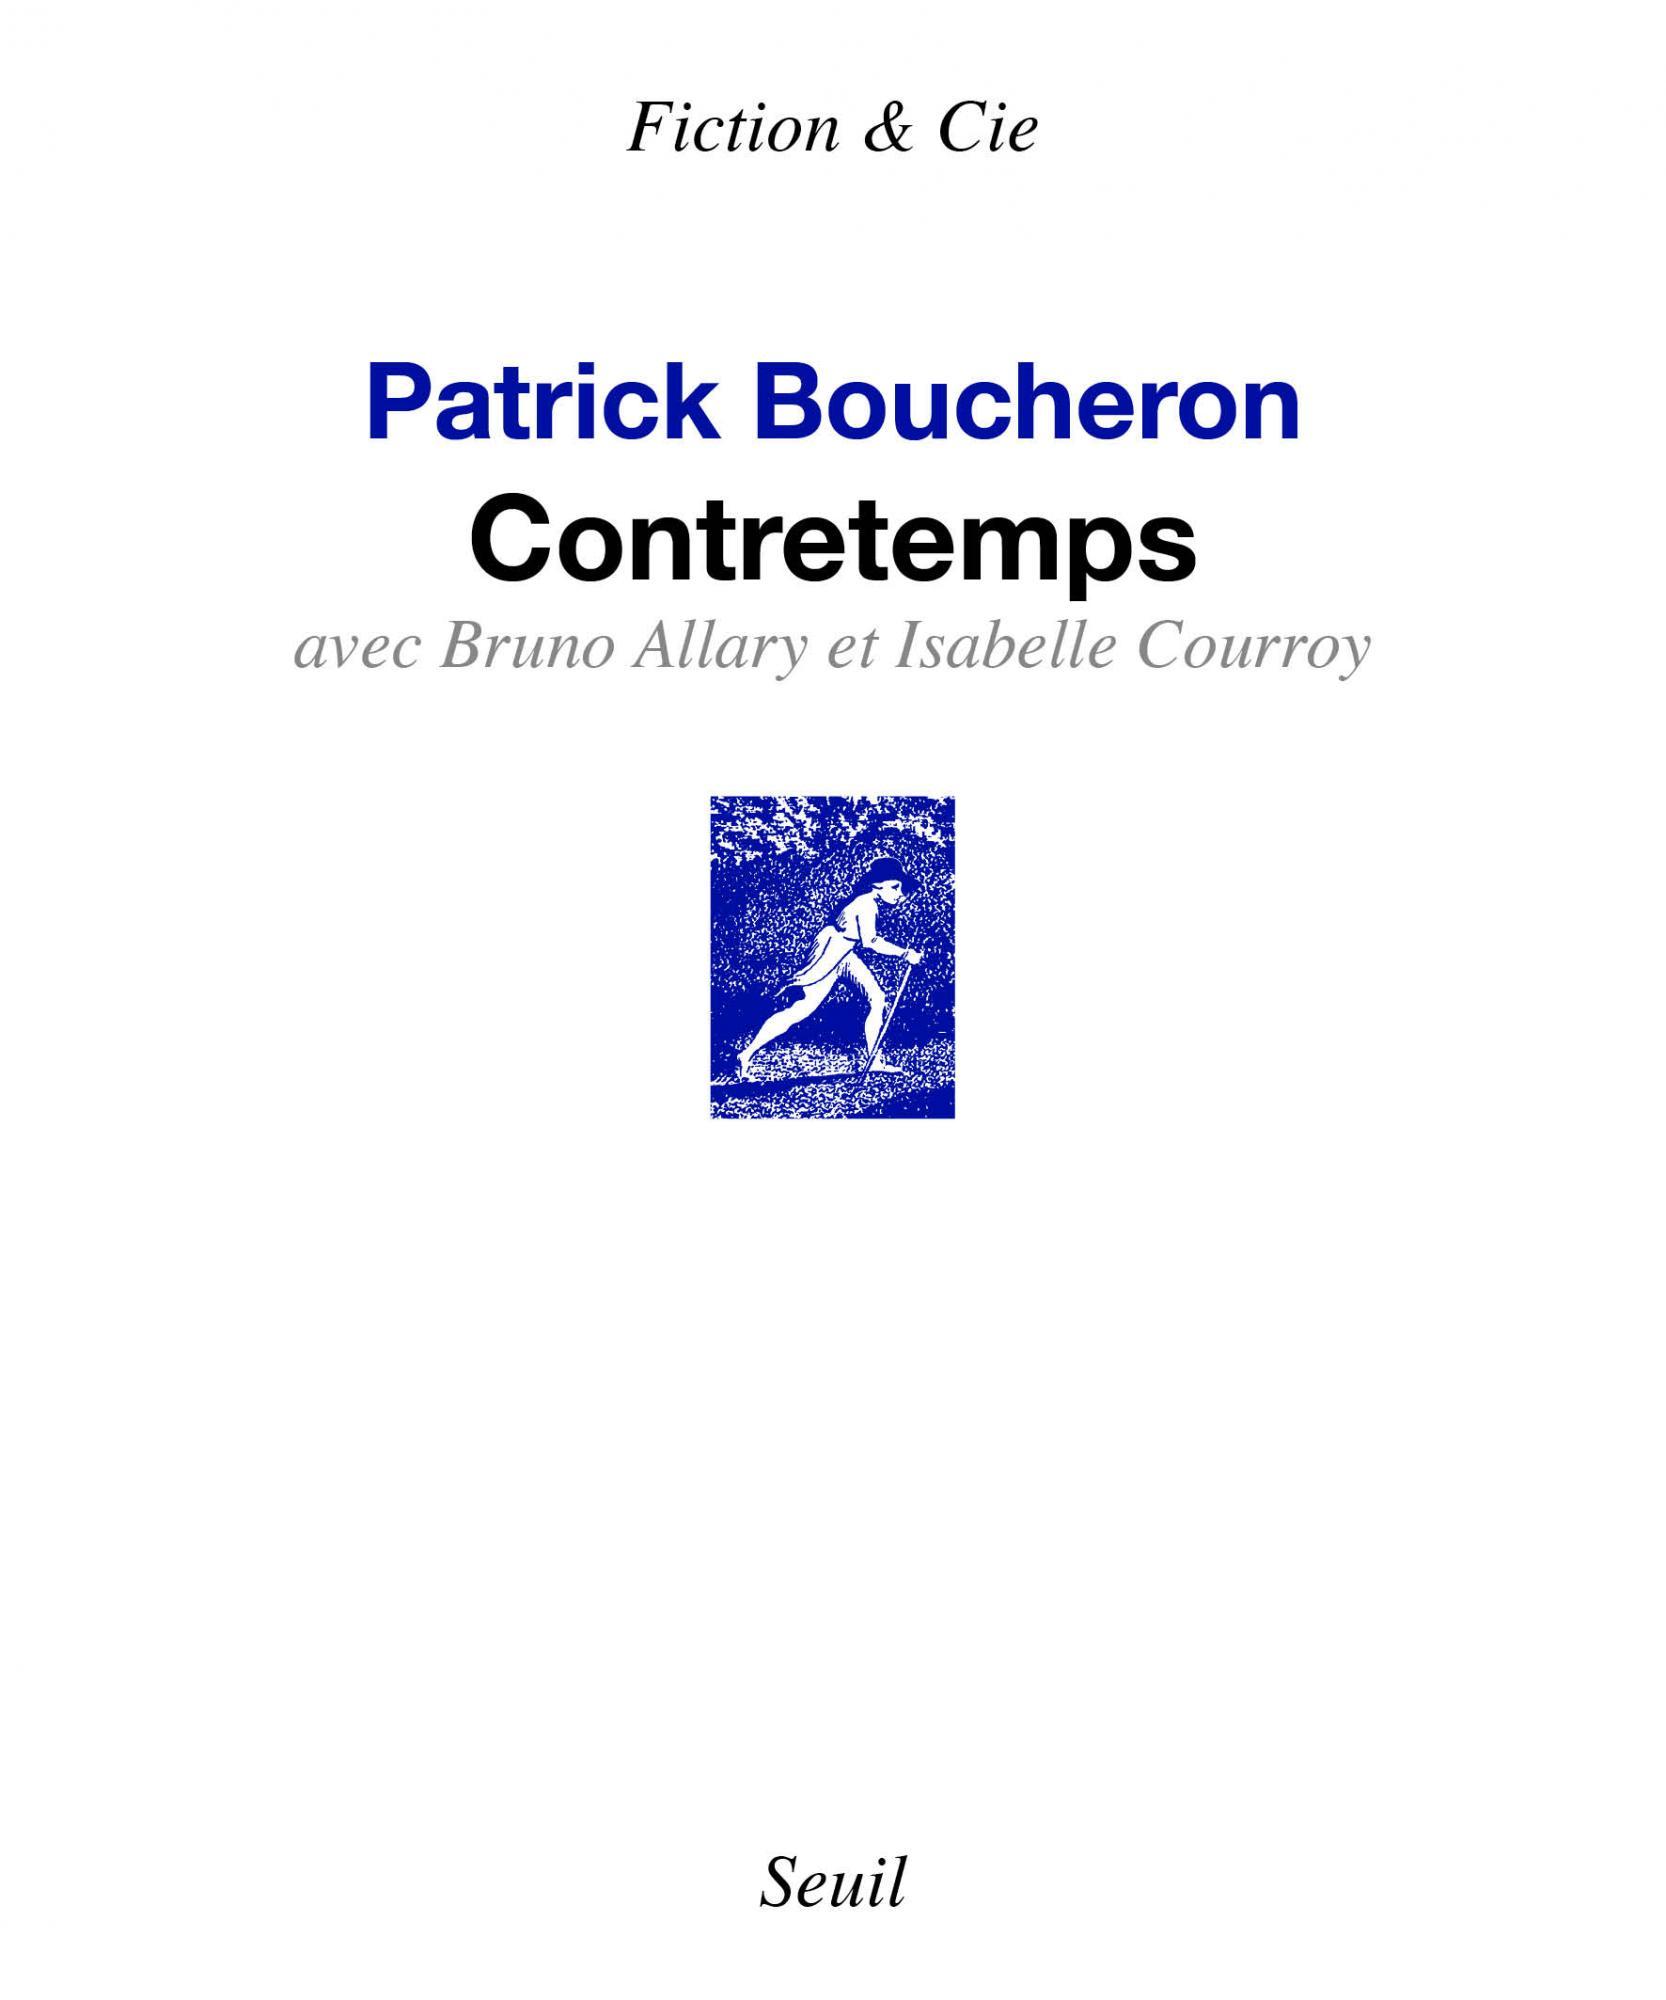 P. Boucheron, B. Allary, I. Courroy, Contretemps